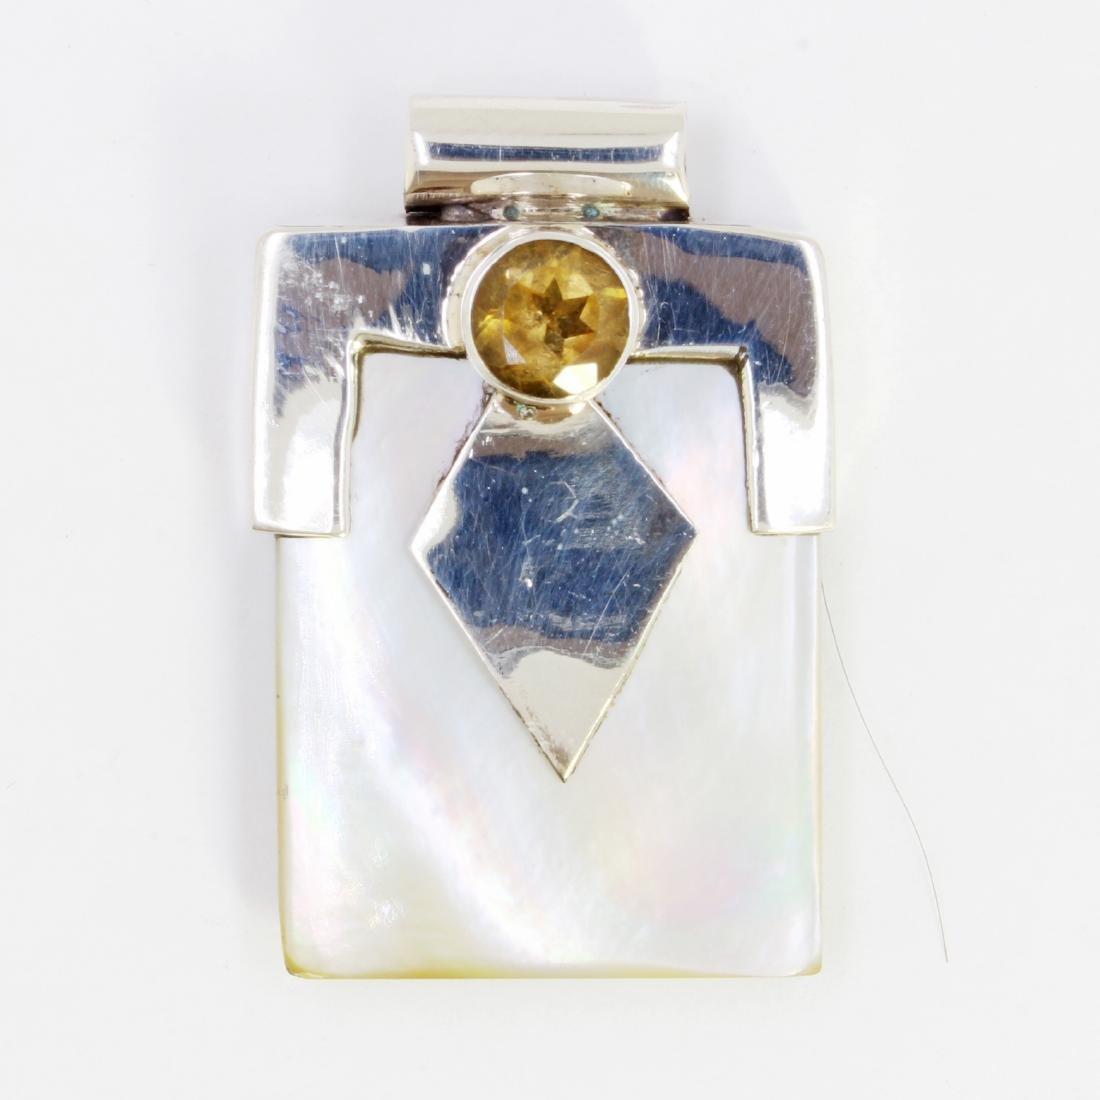 12.92gm Silver & Natural gemstone Pendant